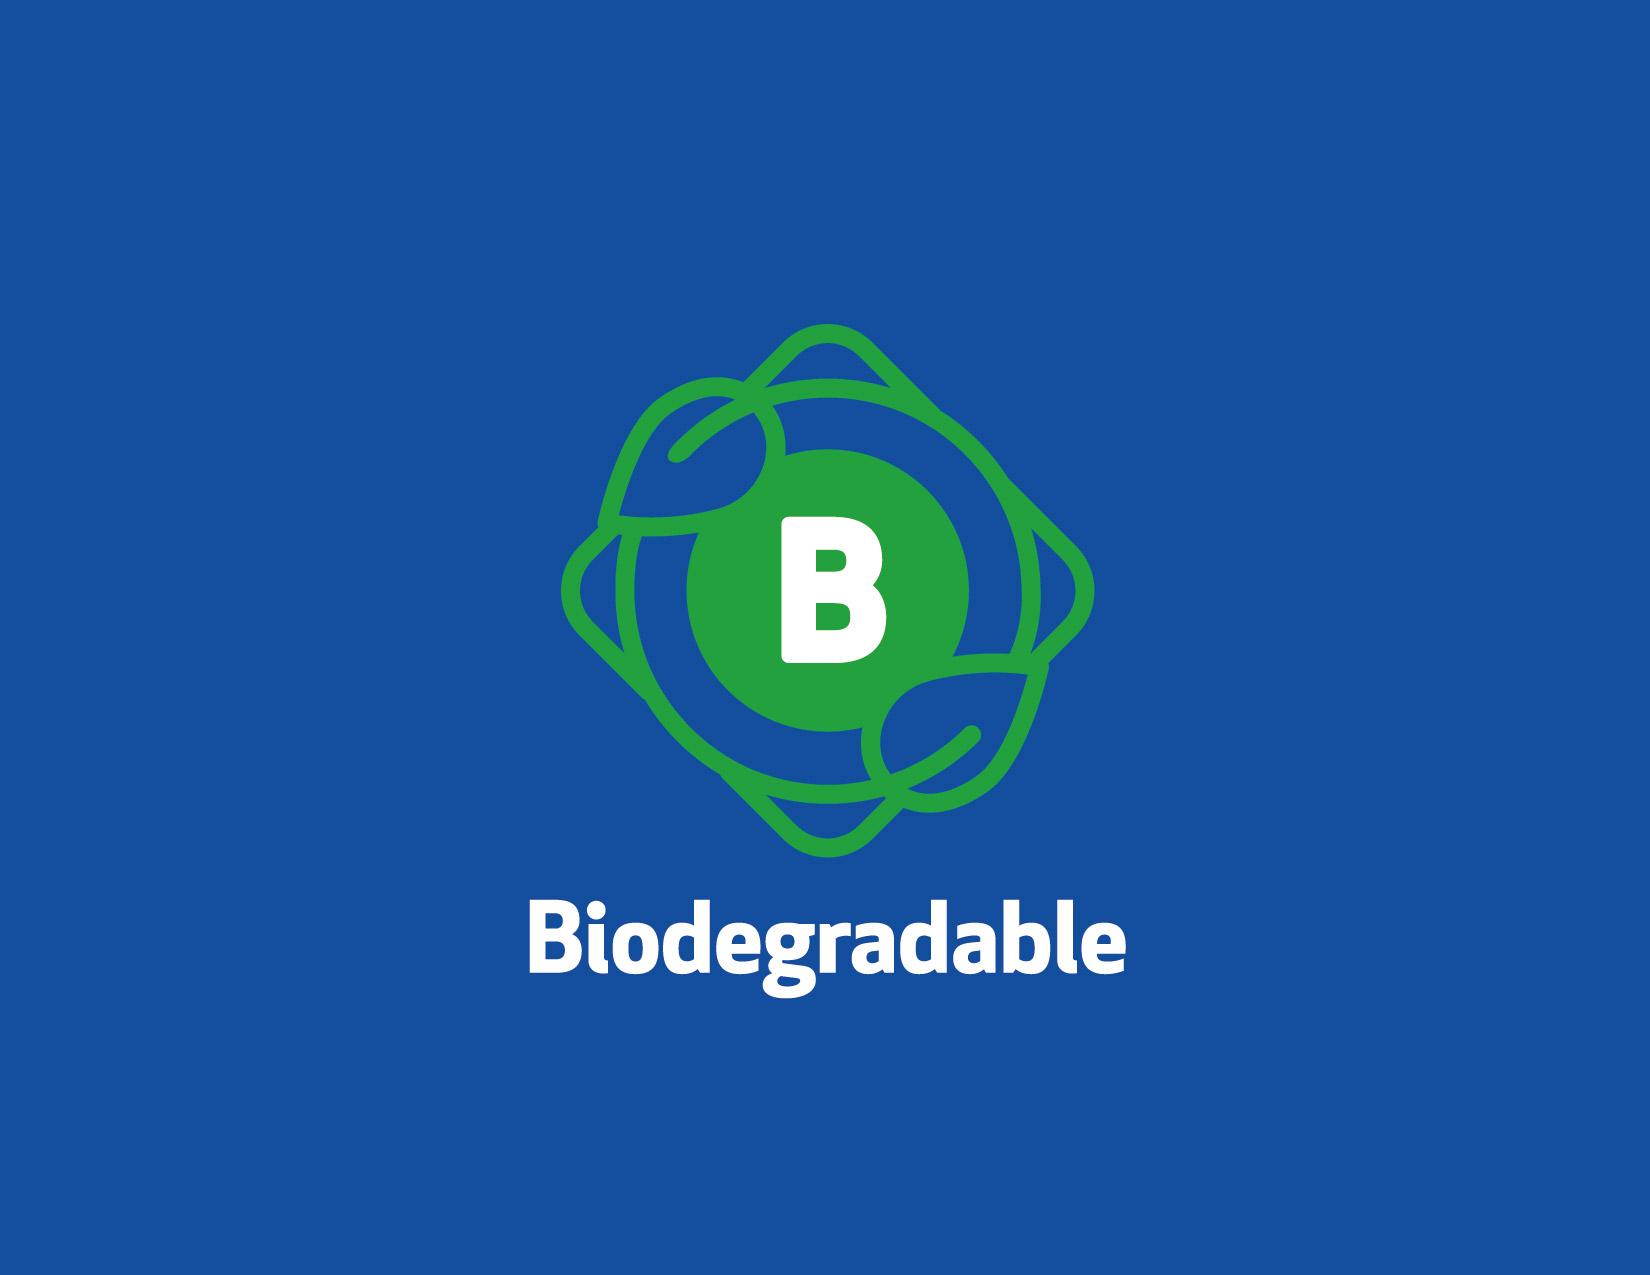 Biodegradable_azul-01 (2)